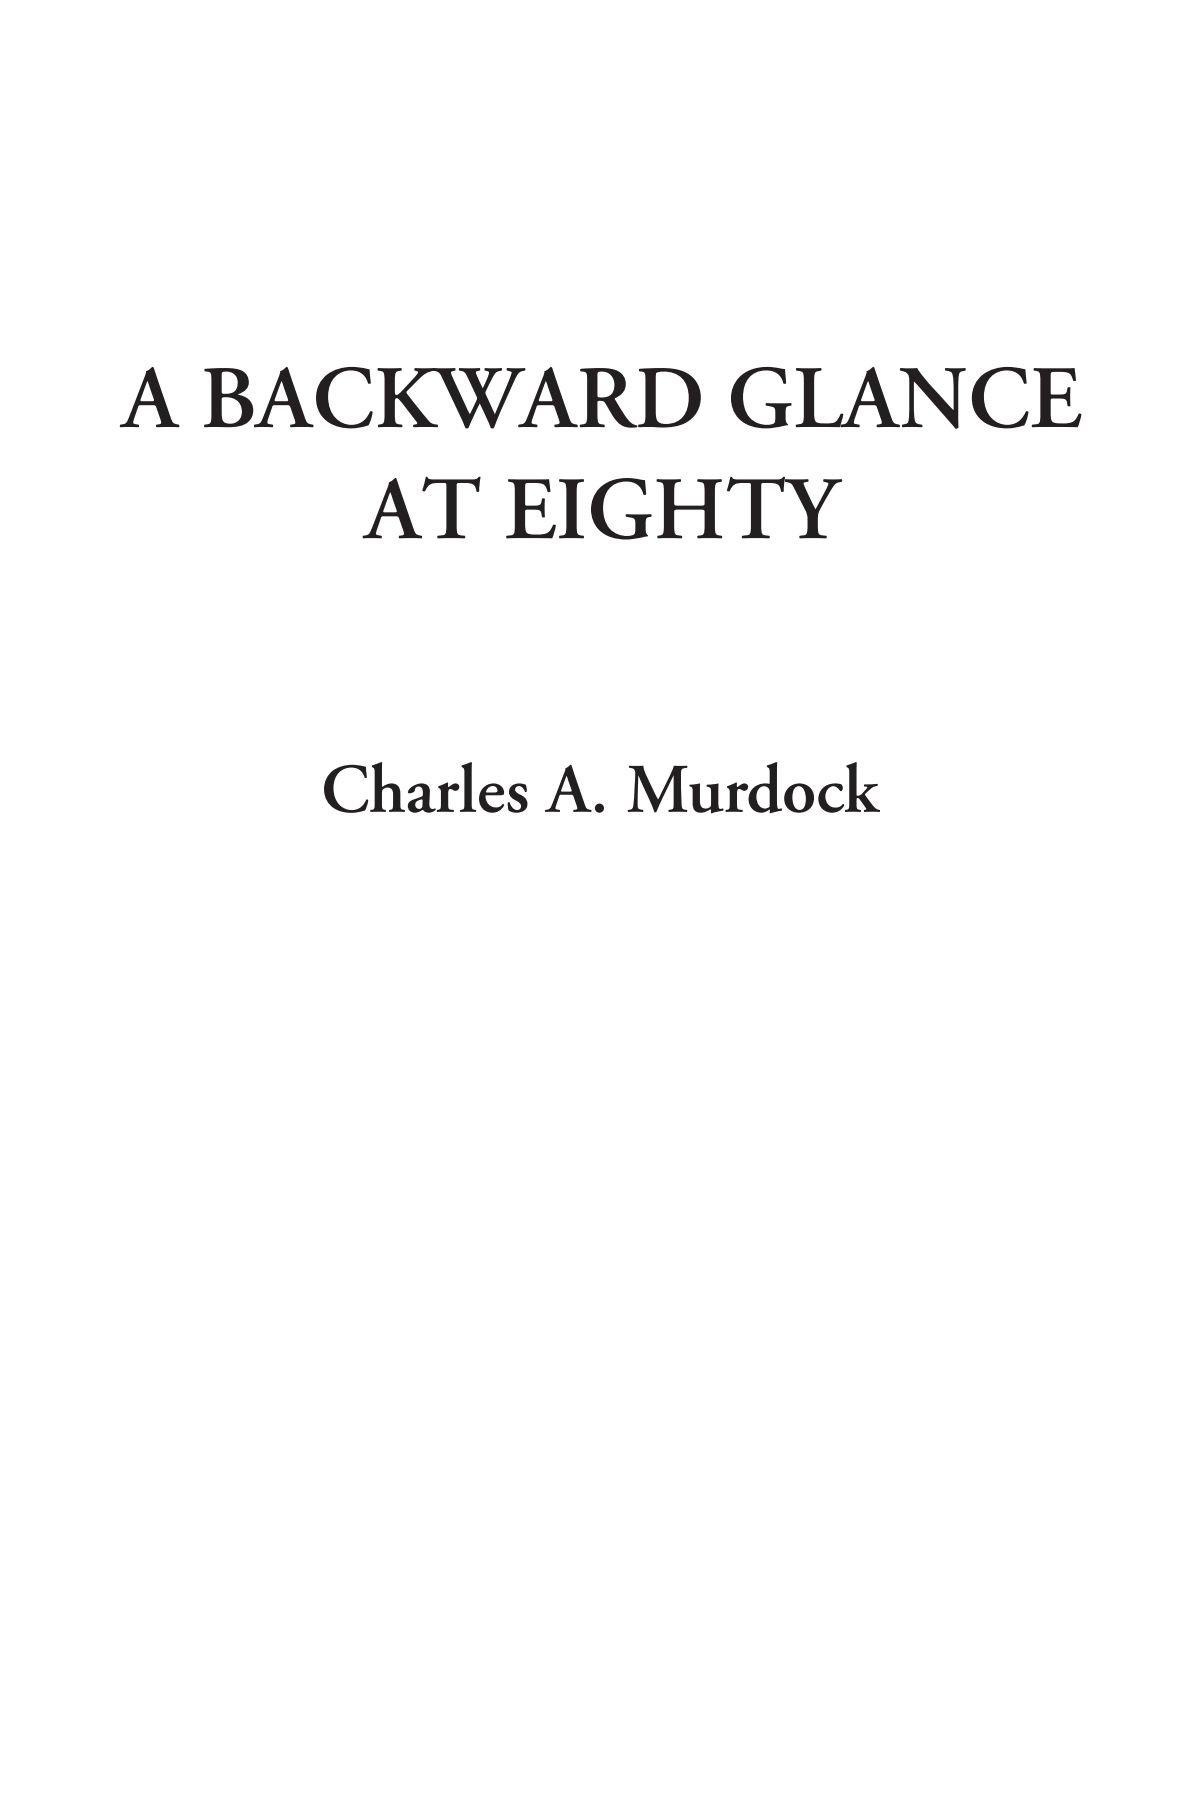 Download A Backward Glance at Eighty pdf